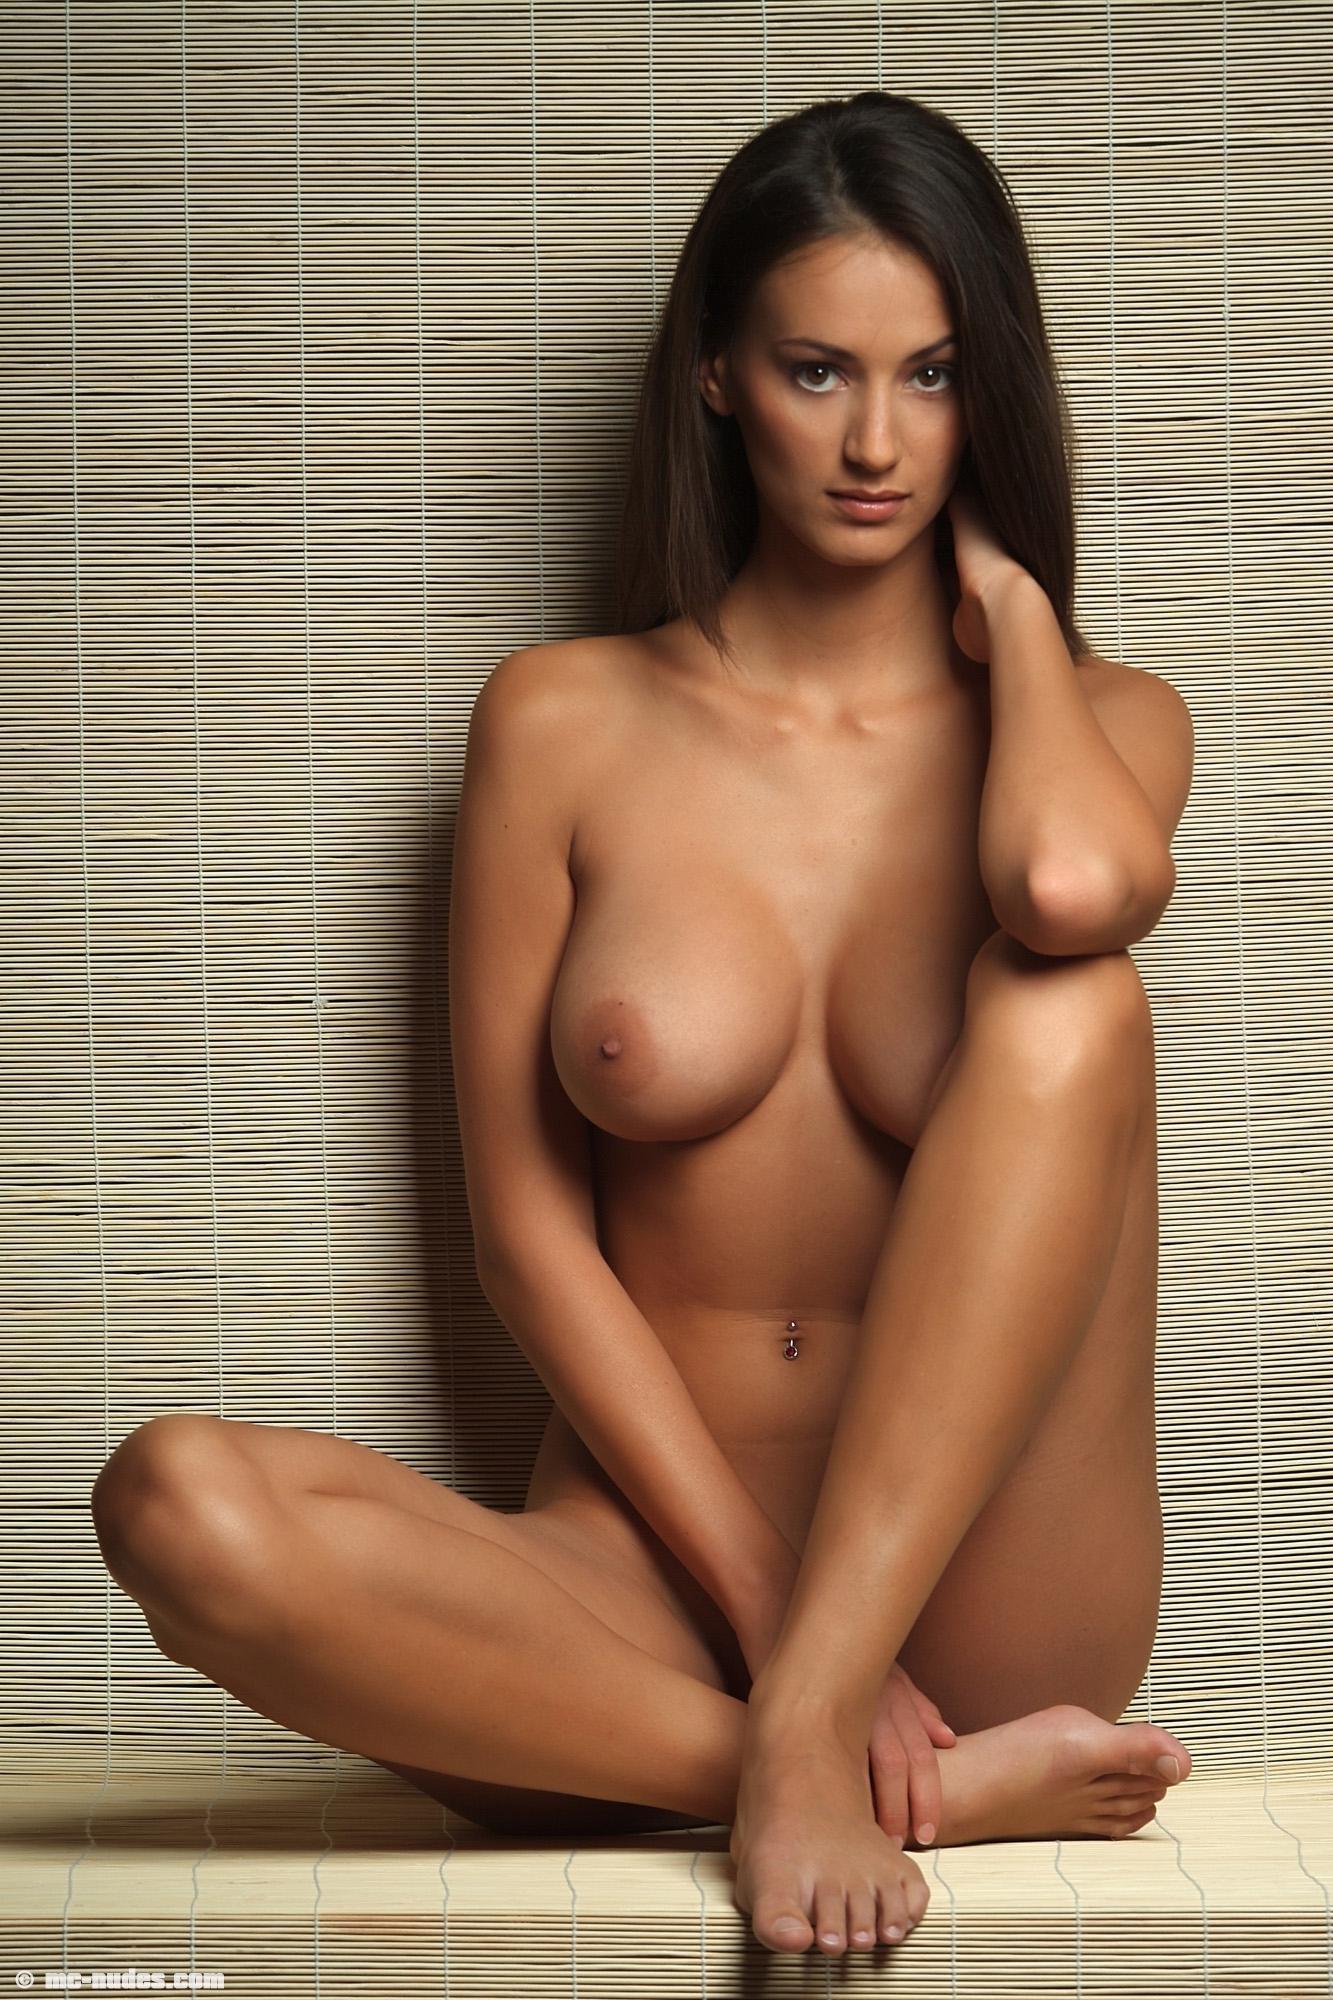 Jill valintine nude pics softcore tubes